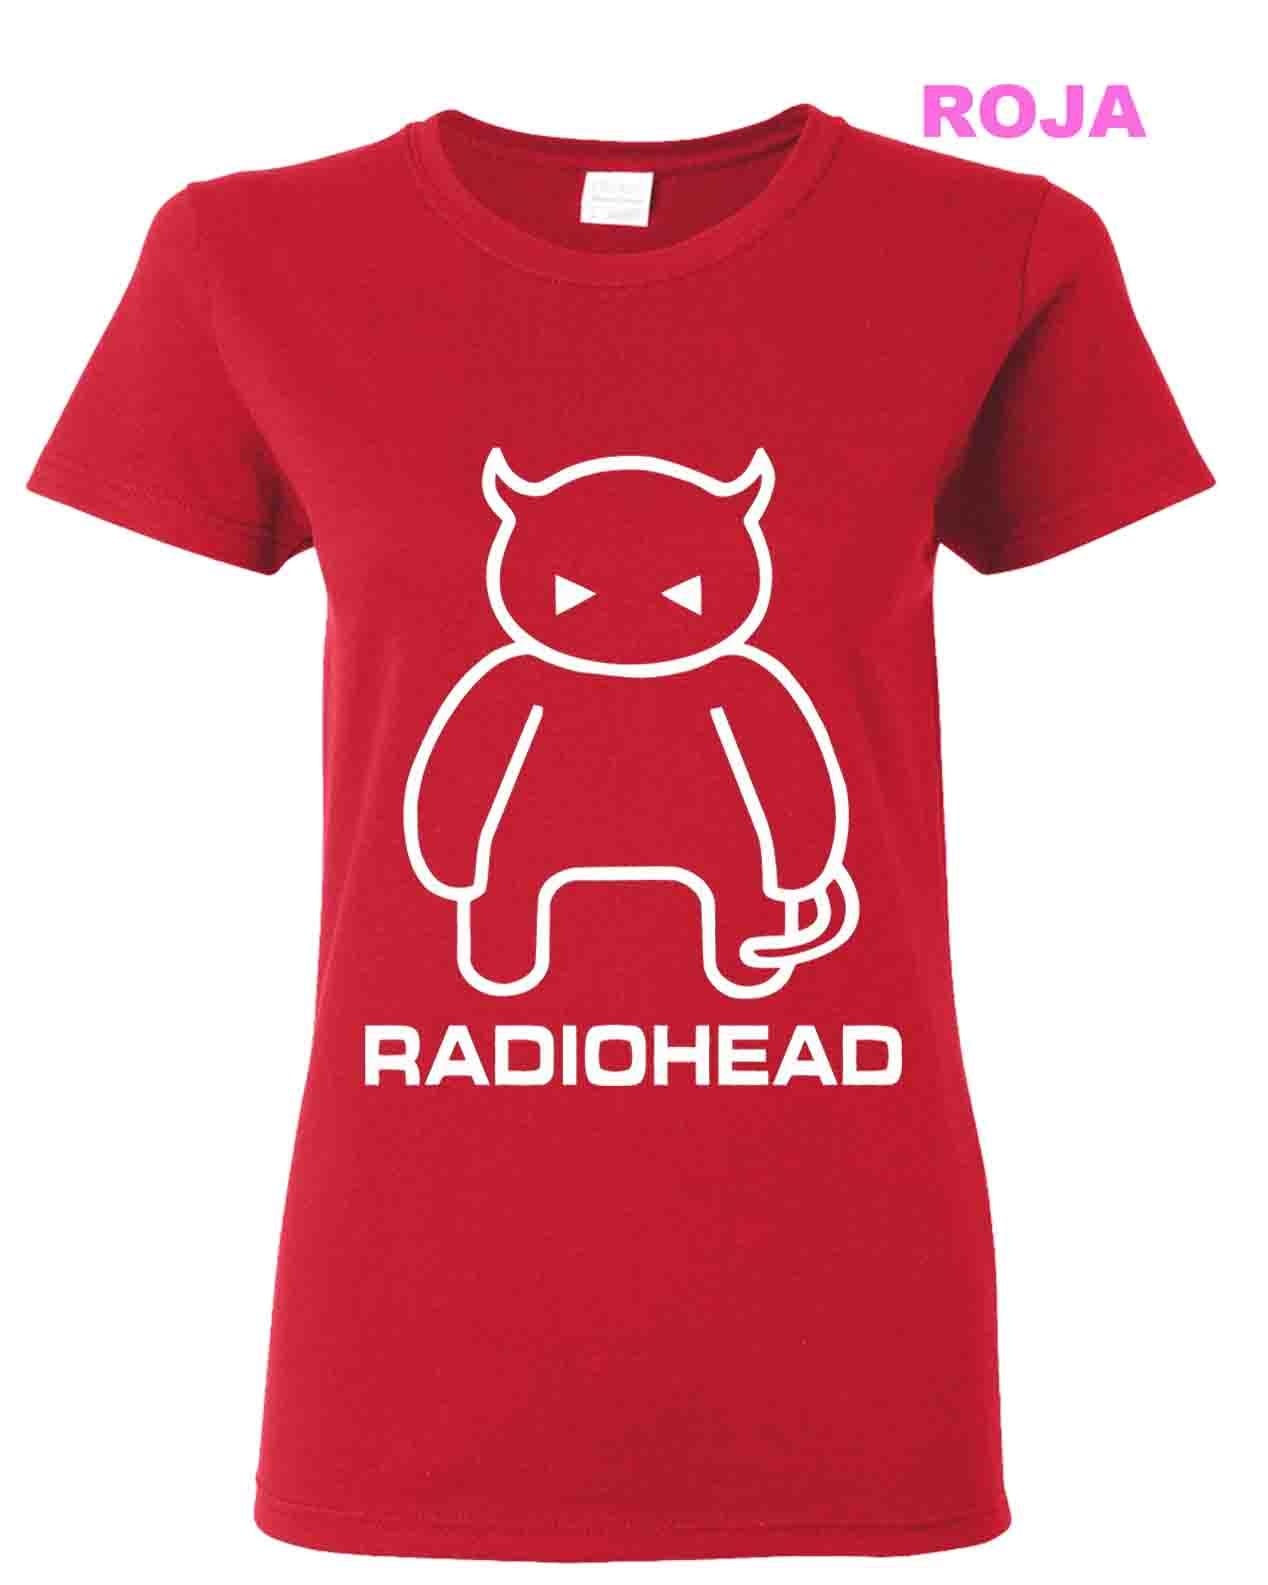 Radiohead - Devil